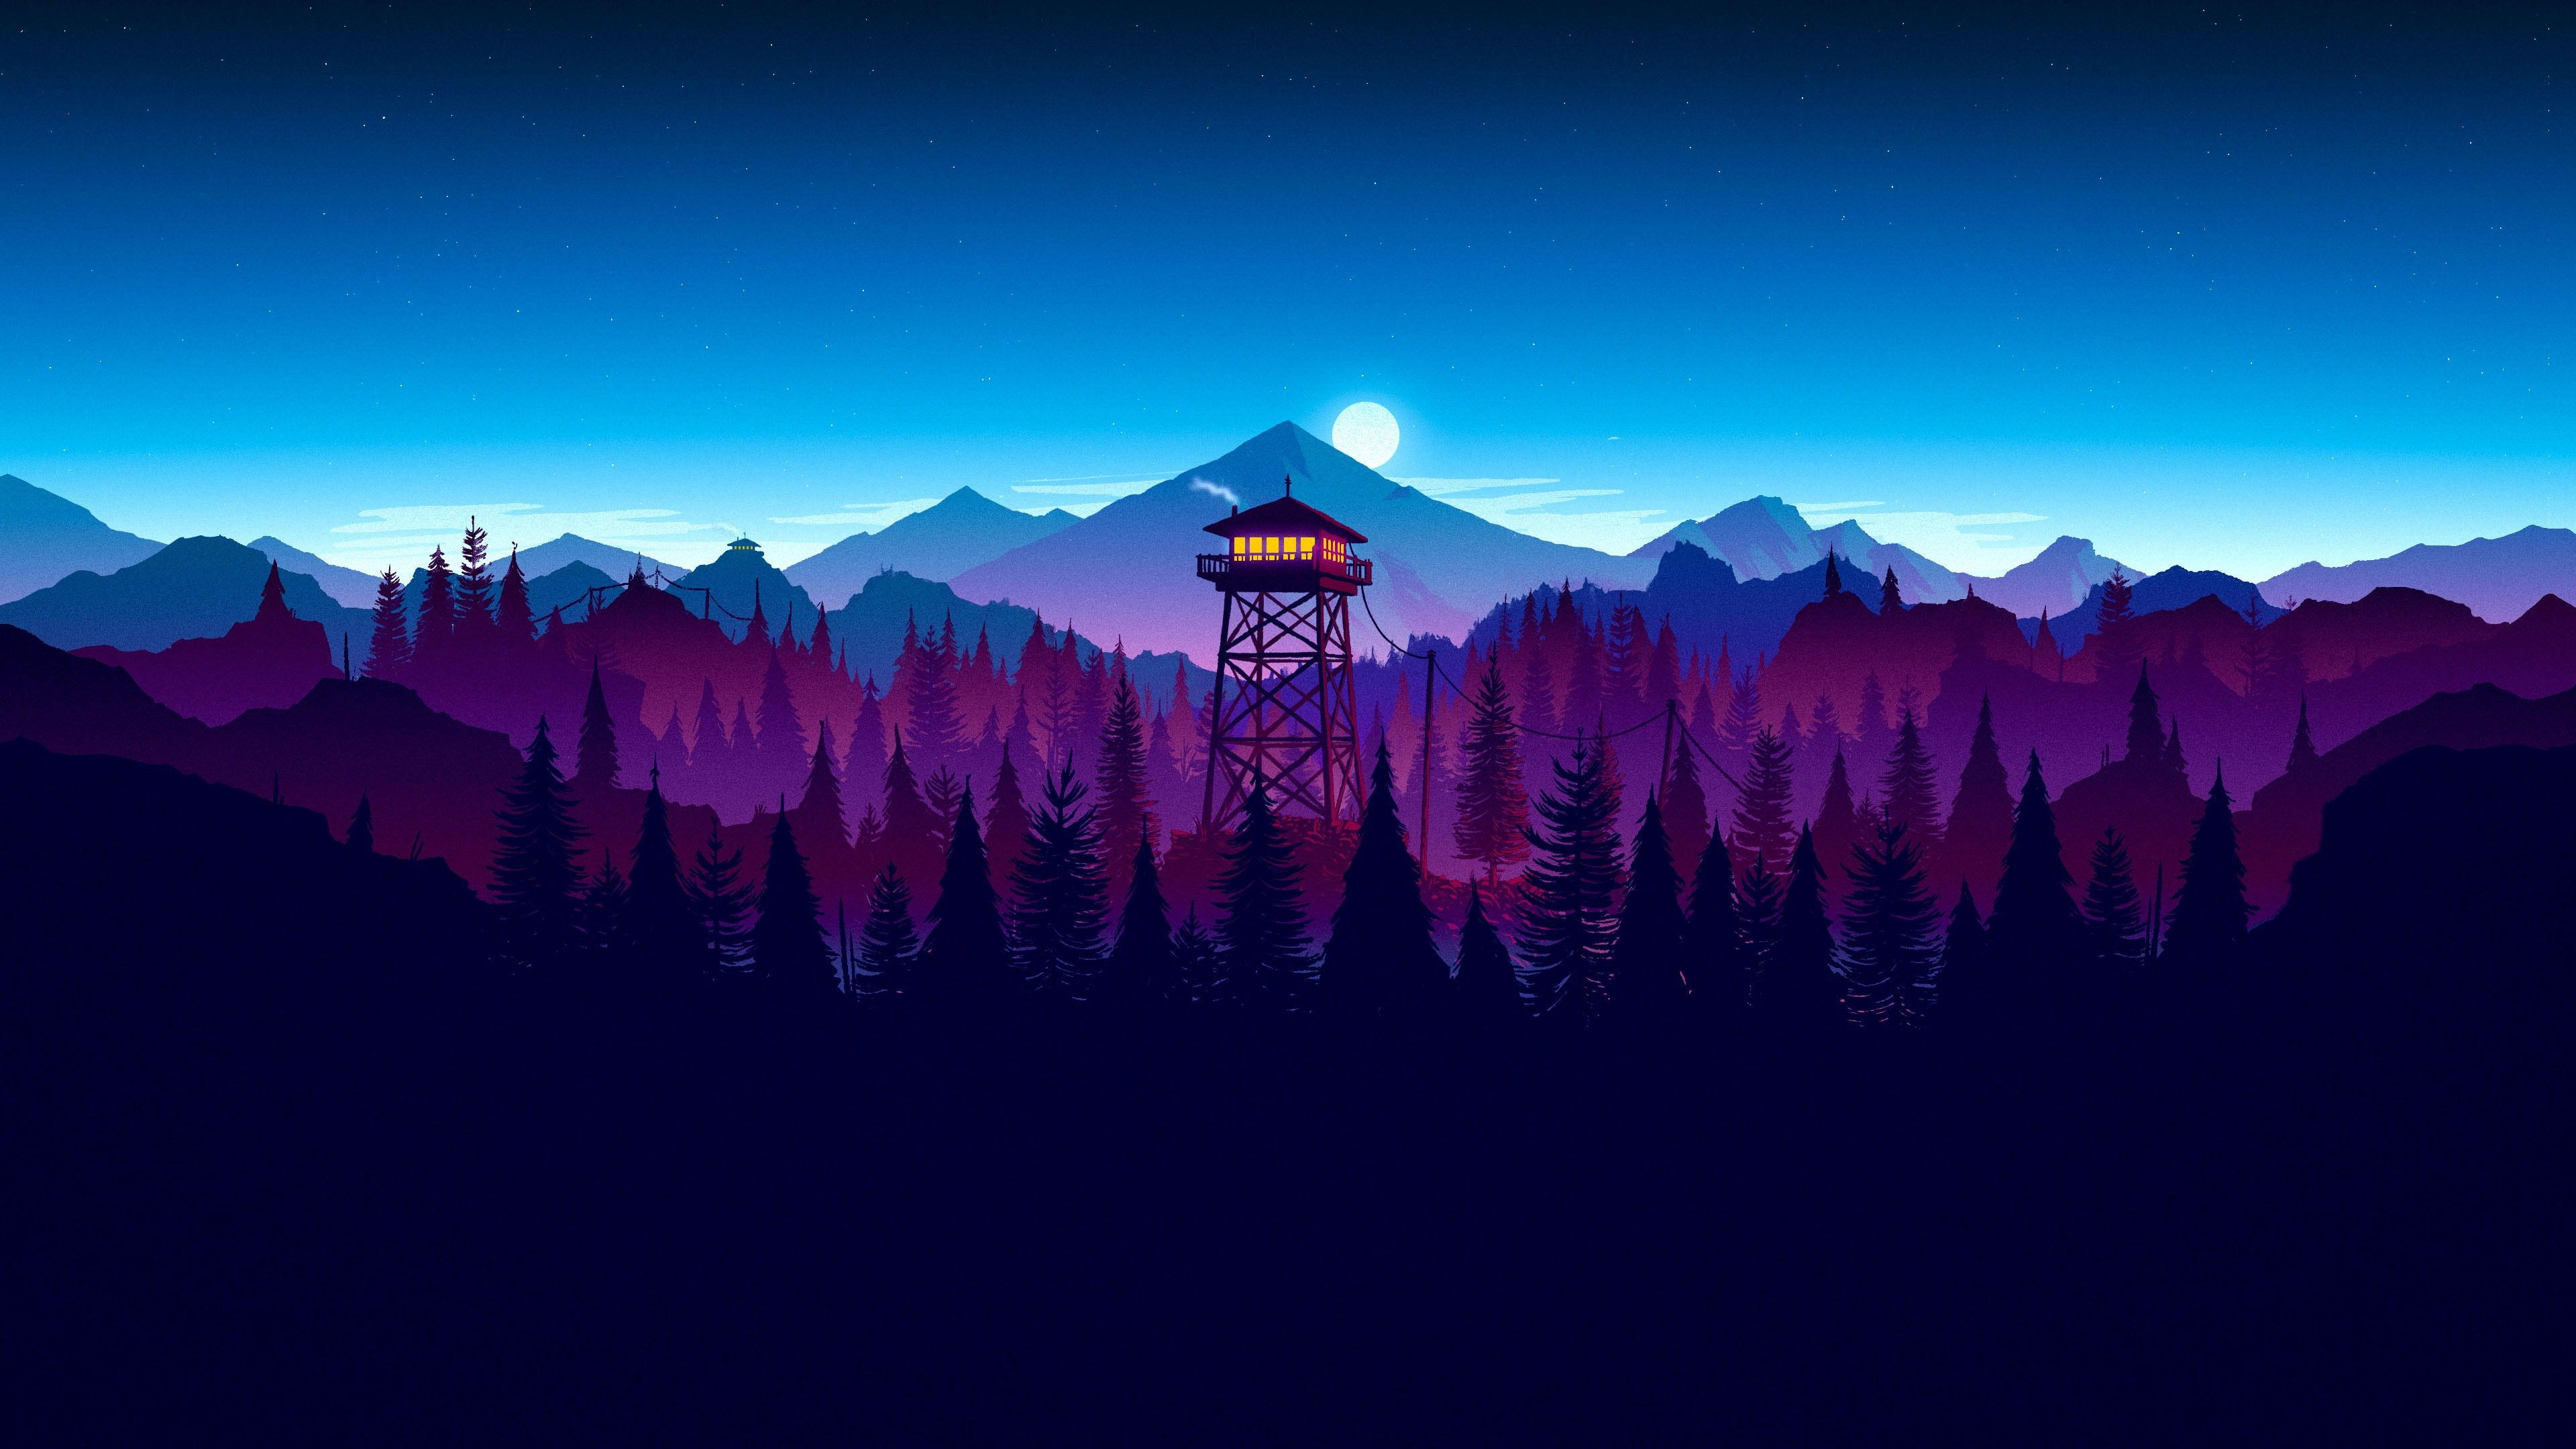 Firewatch At Night 3840 2160 Sunset Artwork Digital Wallpaper Gaming Wallpapers